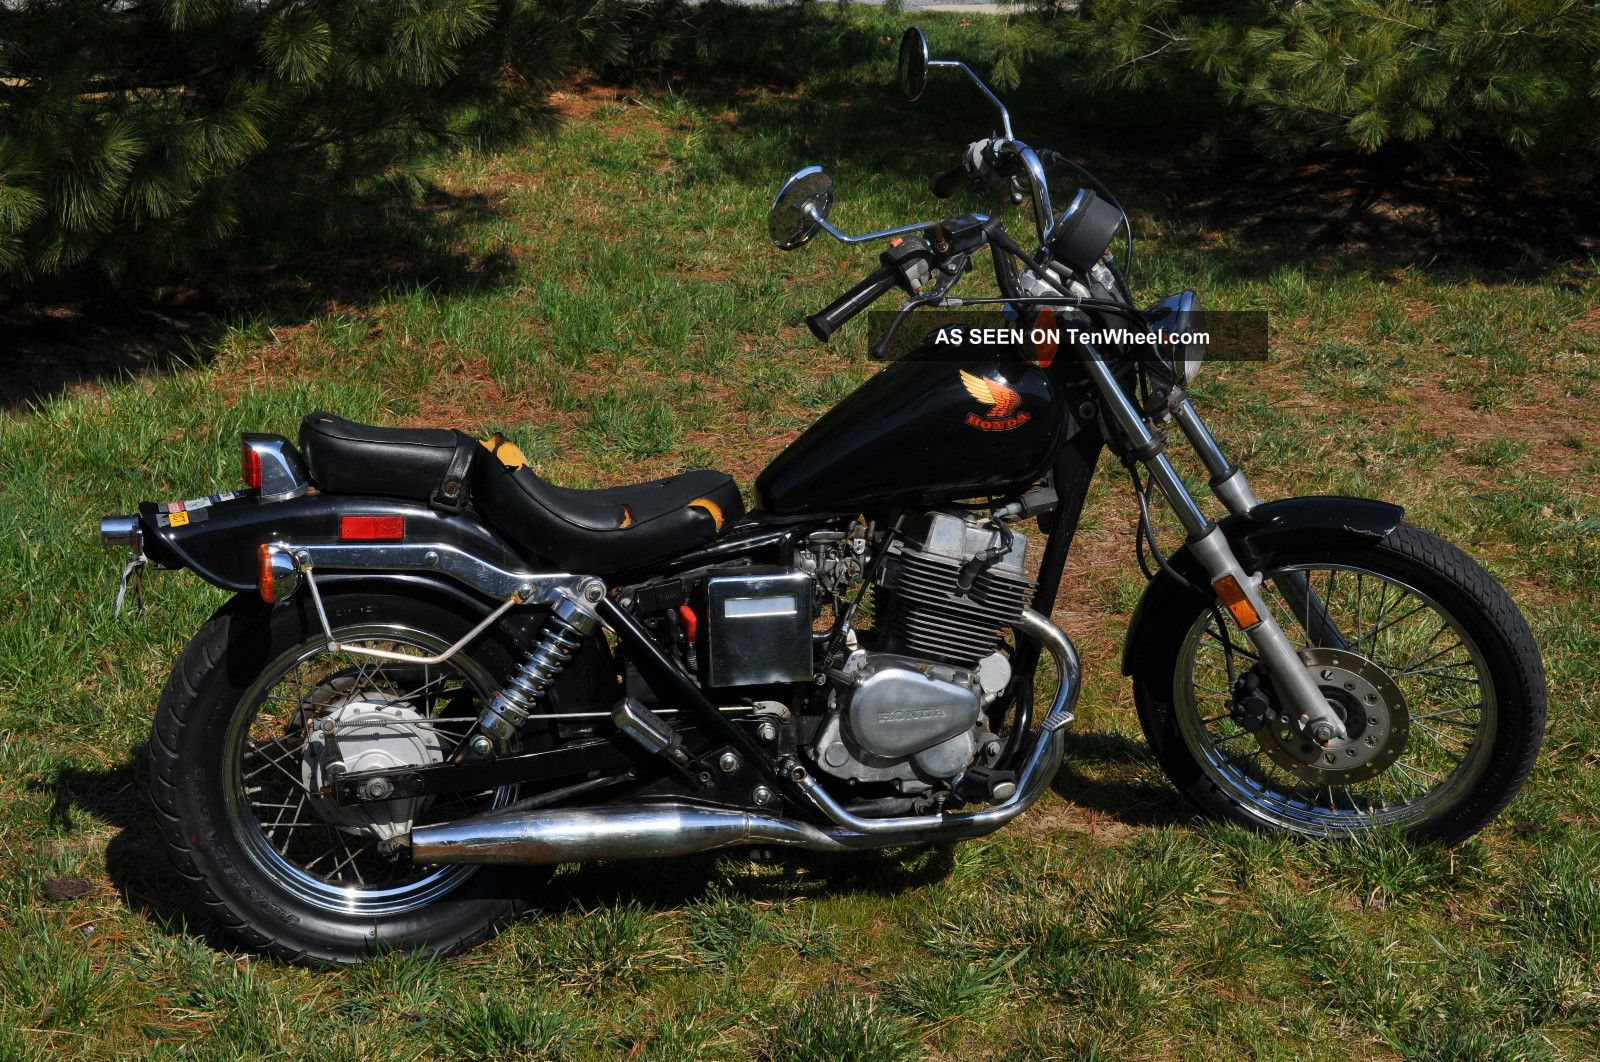 1986 Honda Rebel Wiring Diagram Will Be A Thing 85 Mustang Engine Cmx250c 250 Transalp 86 Alternator